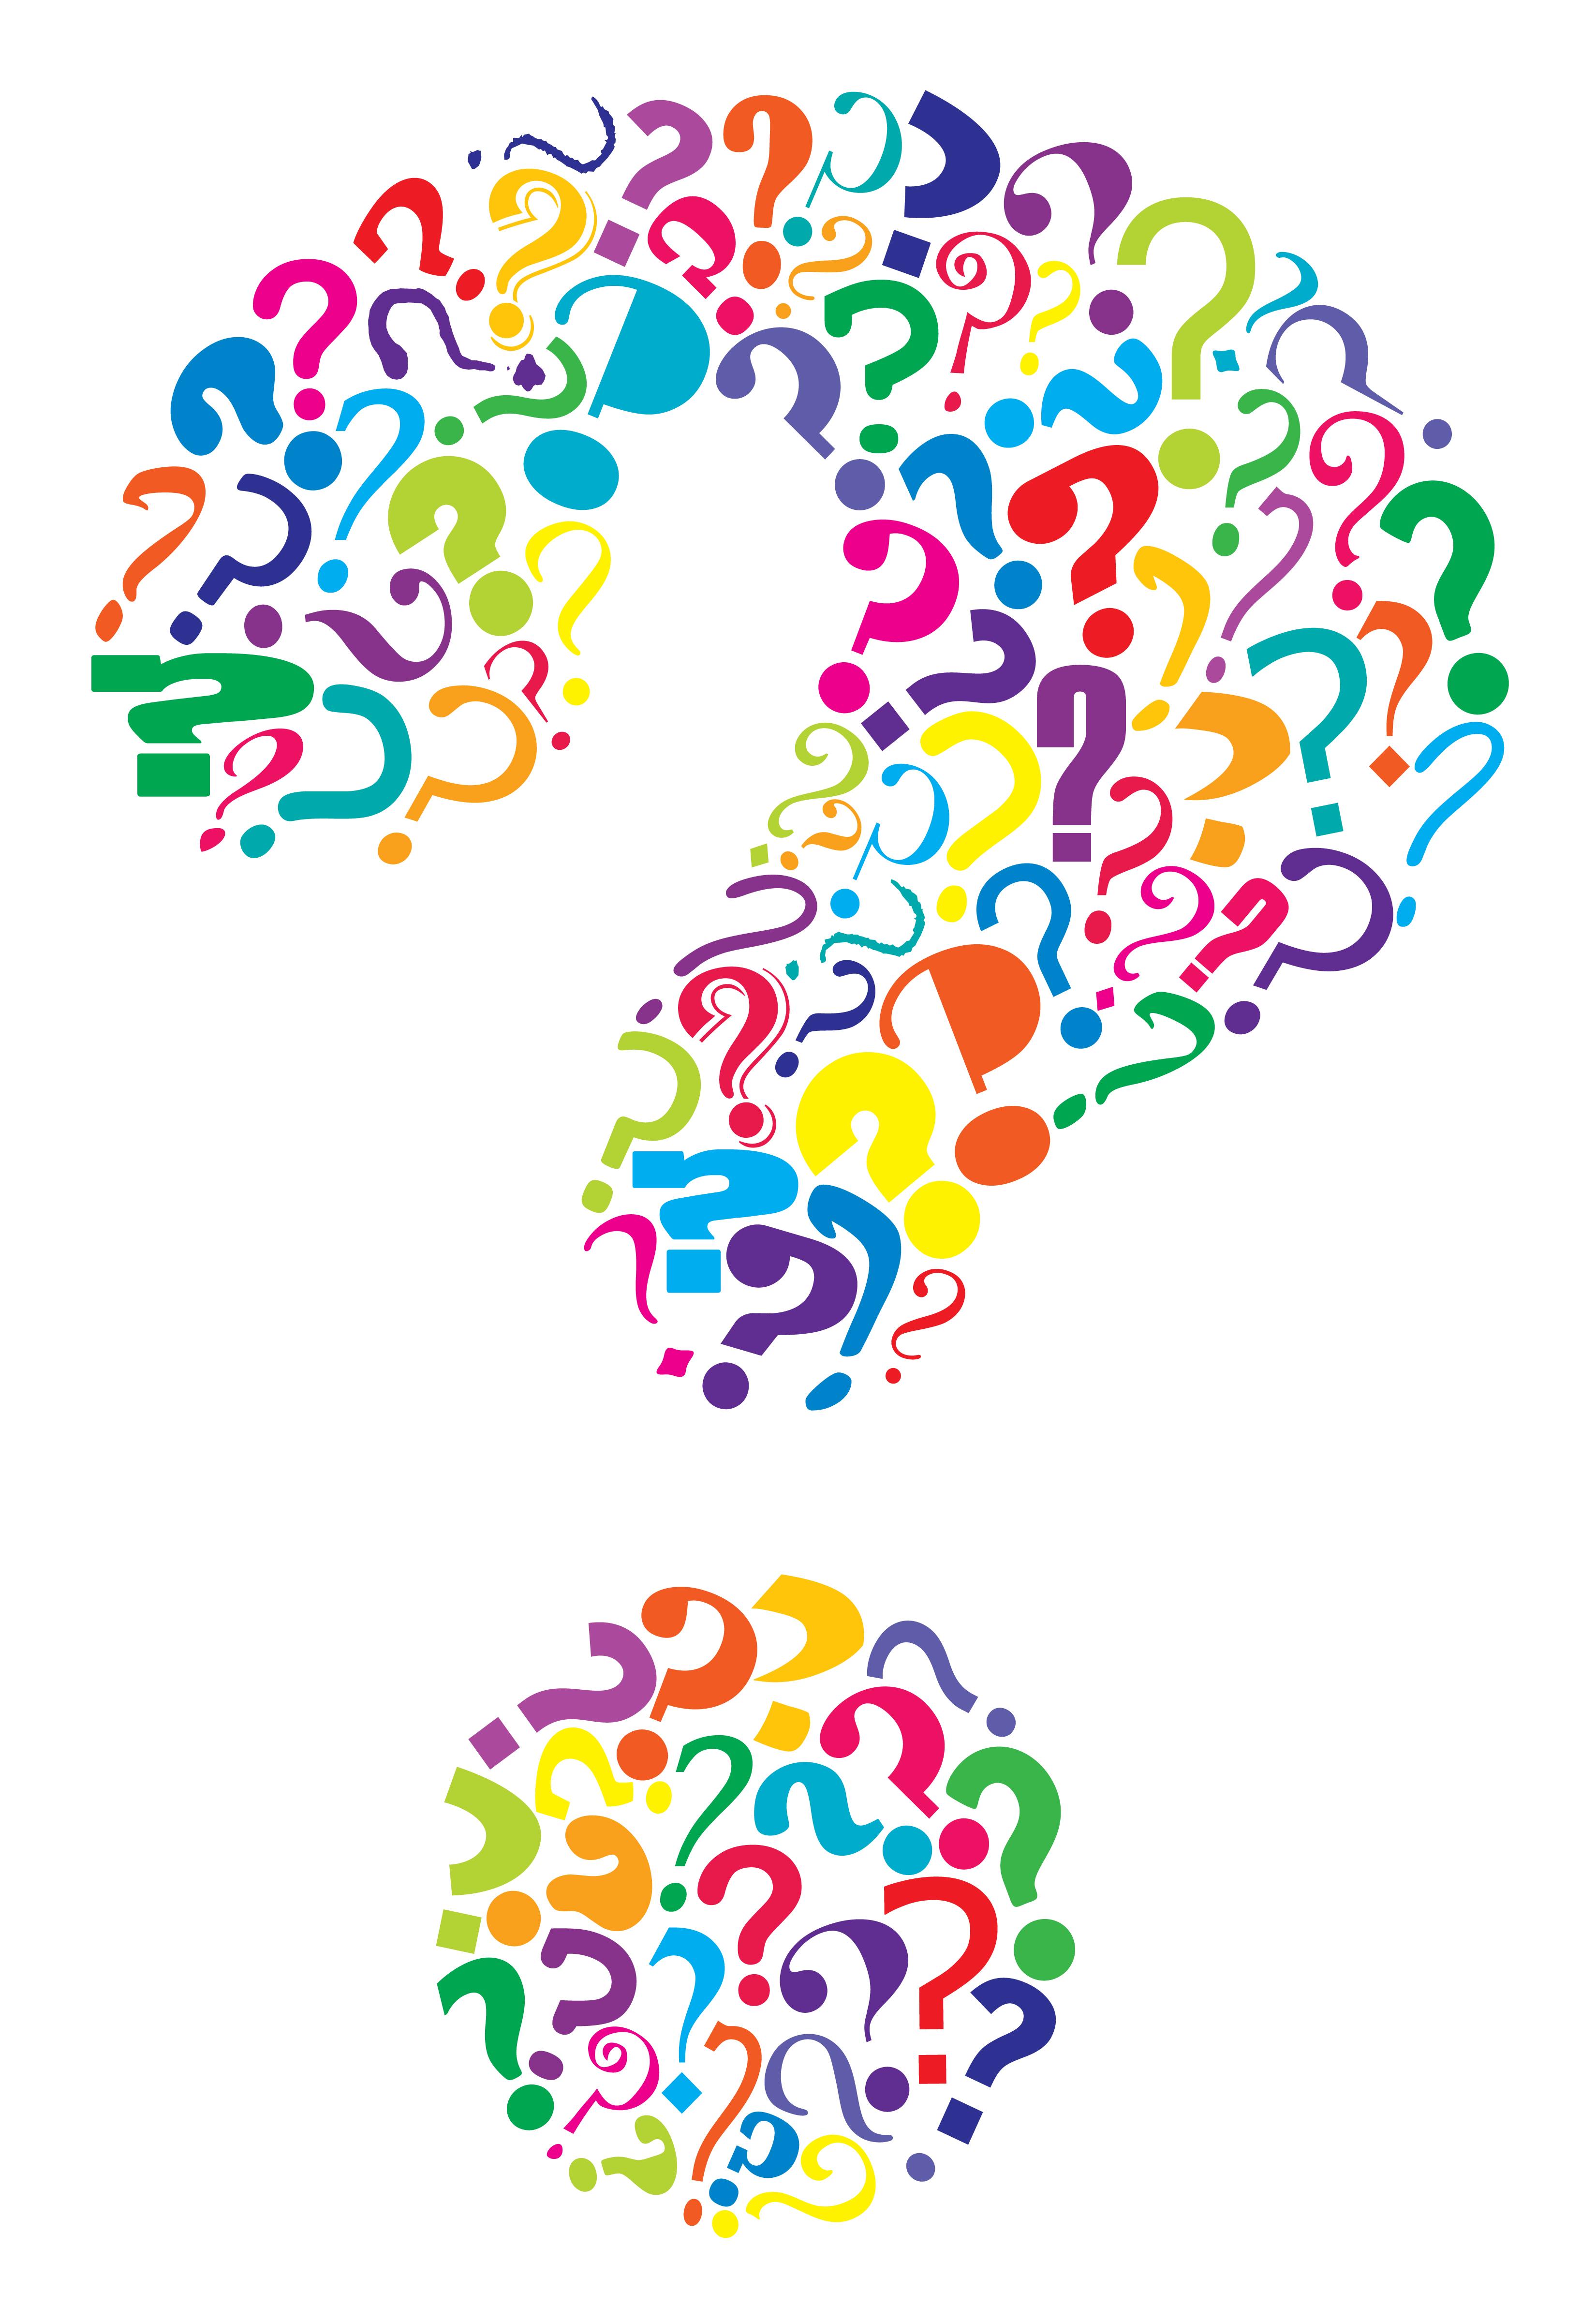 Clipart of question mark-Clipart of question mark-13